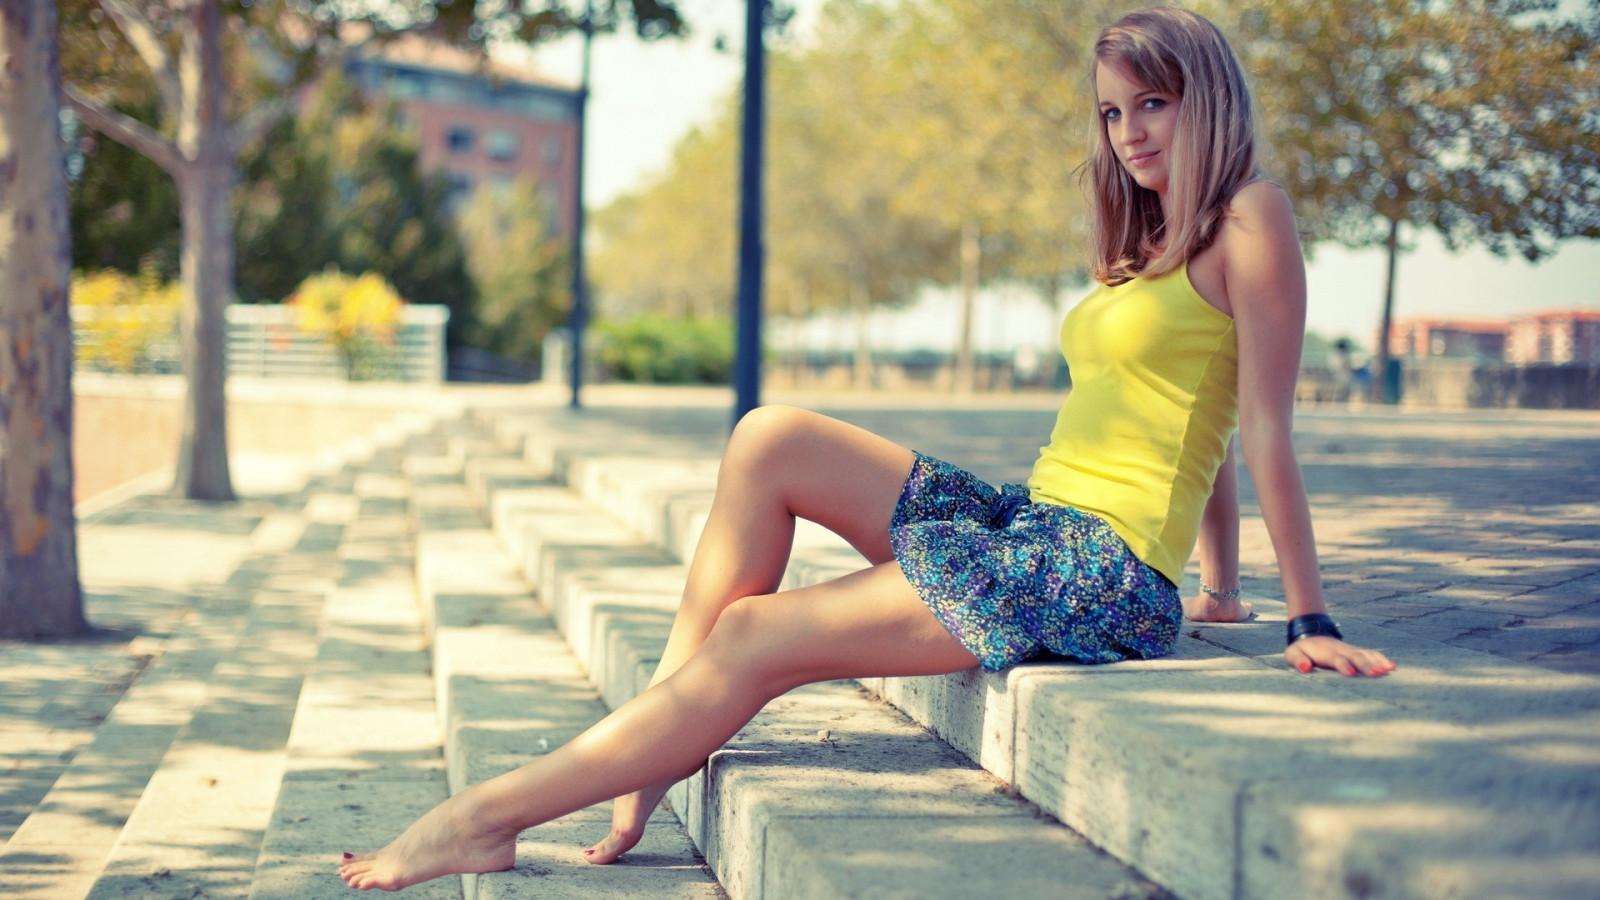 Girls in miniskirt photos